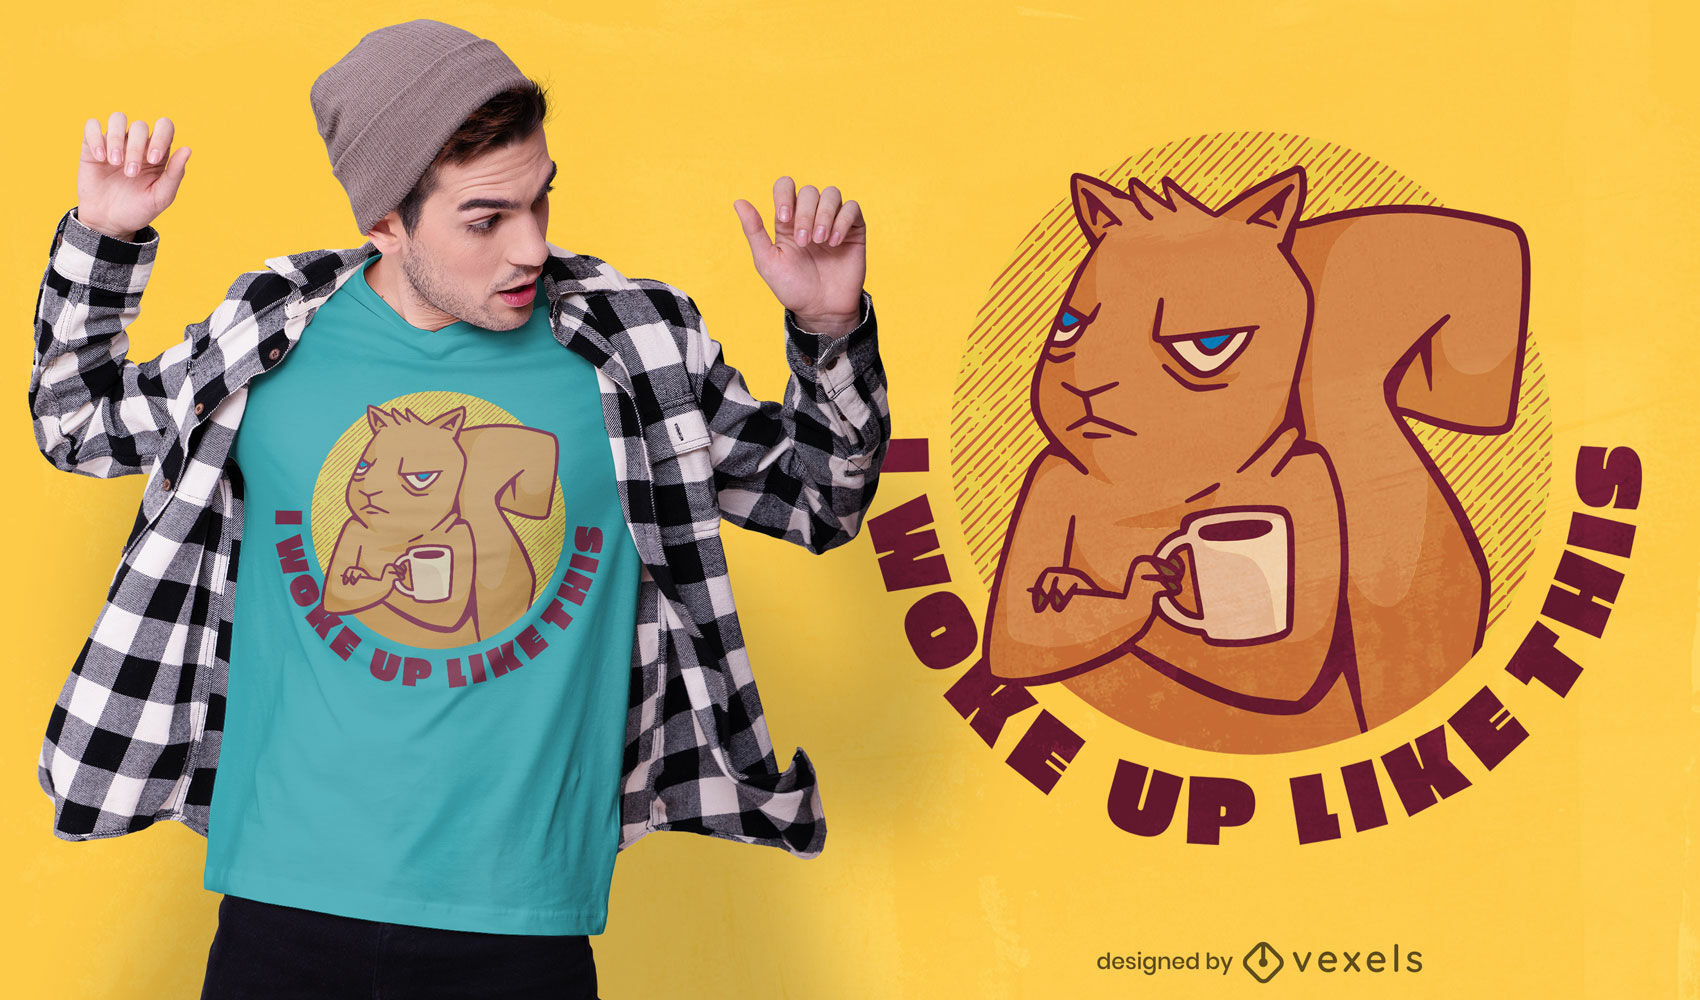 Grumpy squirrel cartoon t-shirt design